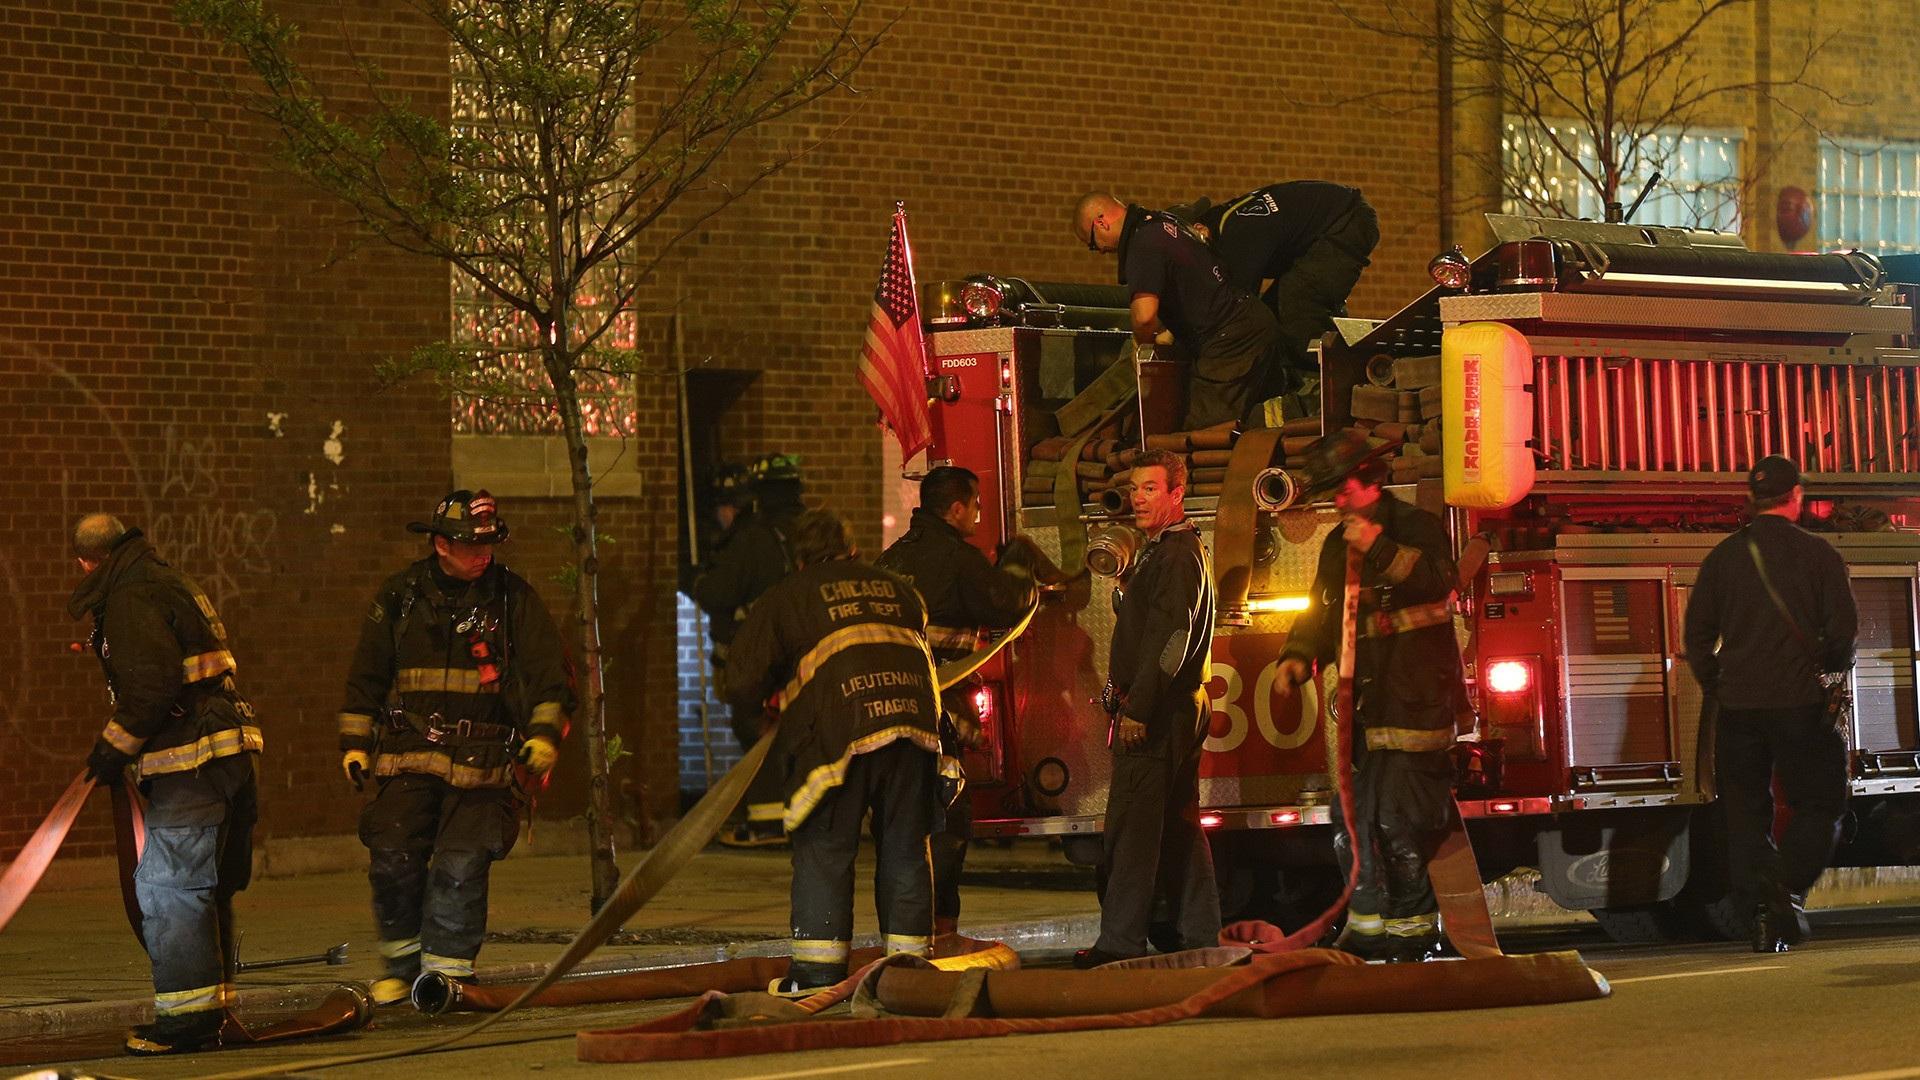 Chicago Fire Department Wallpaper - WallpaperSafari